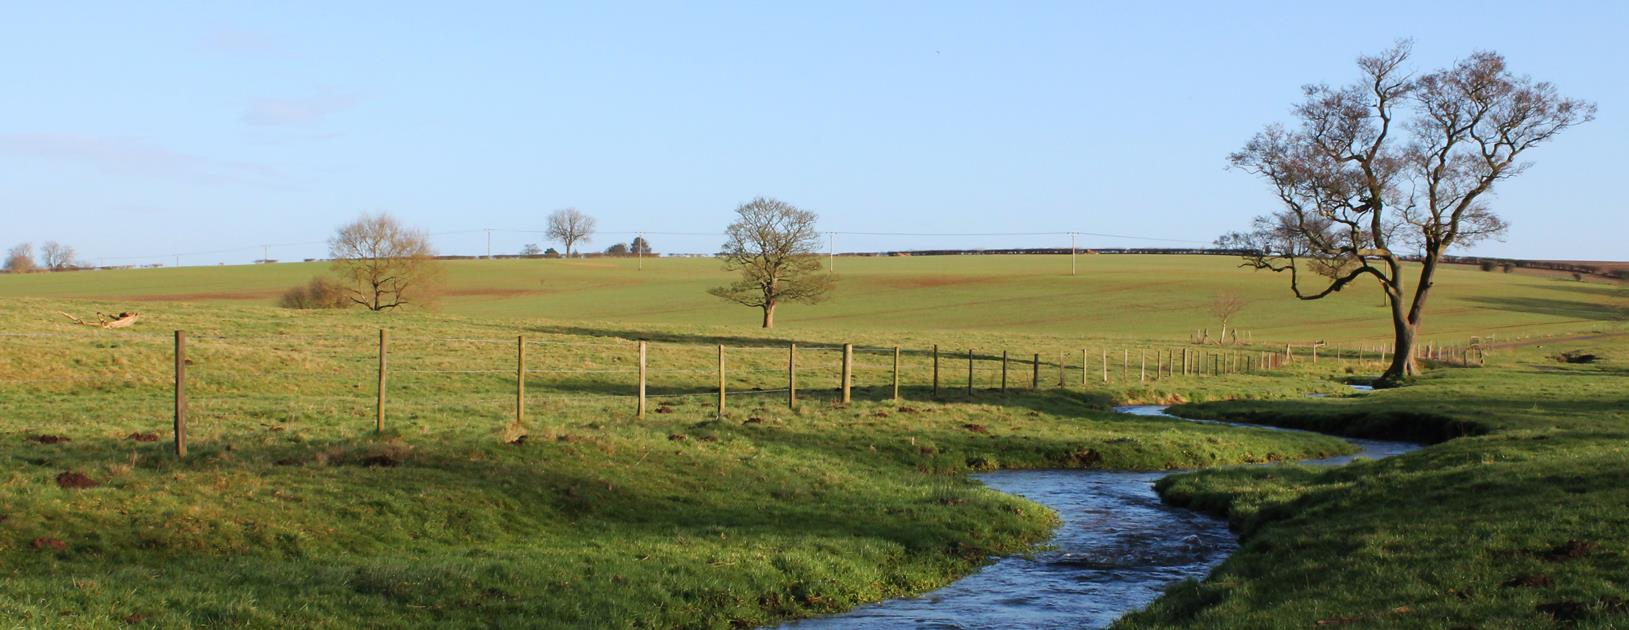 Lincolnshire Chalk Streams Project